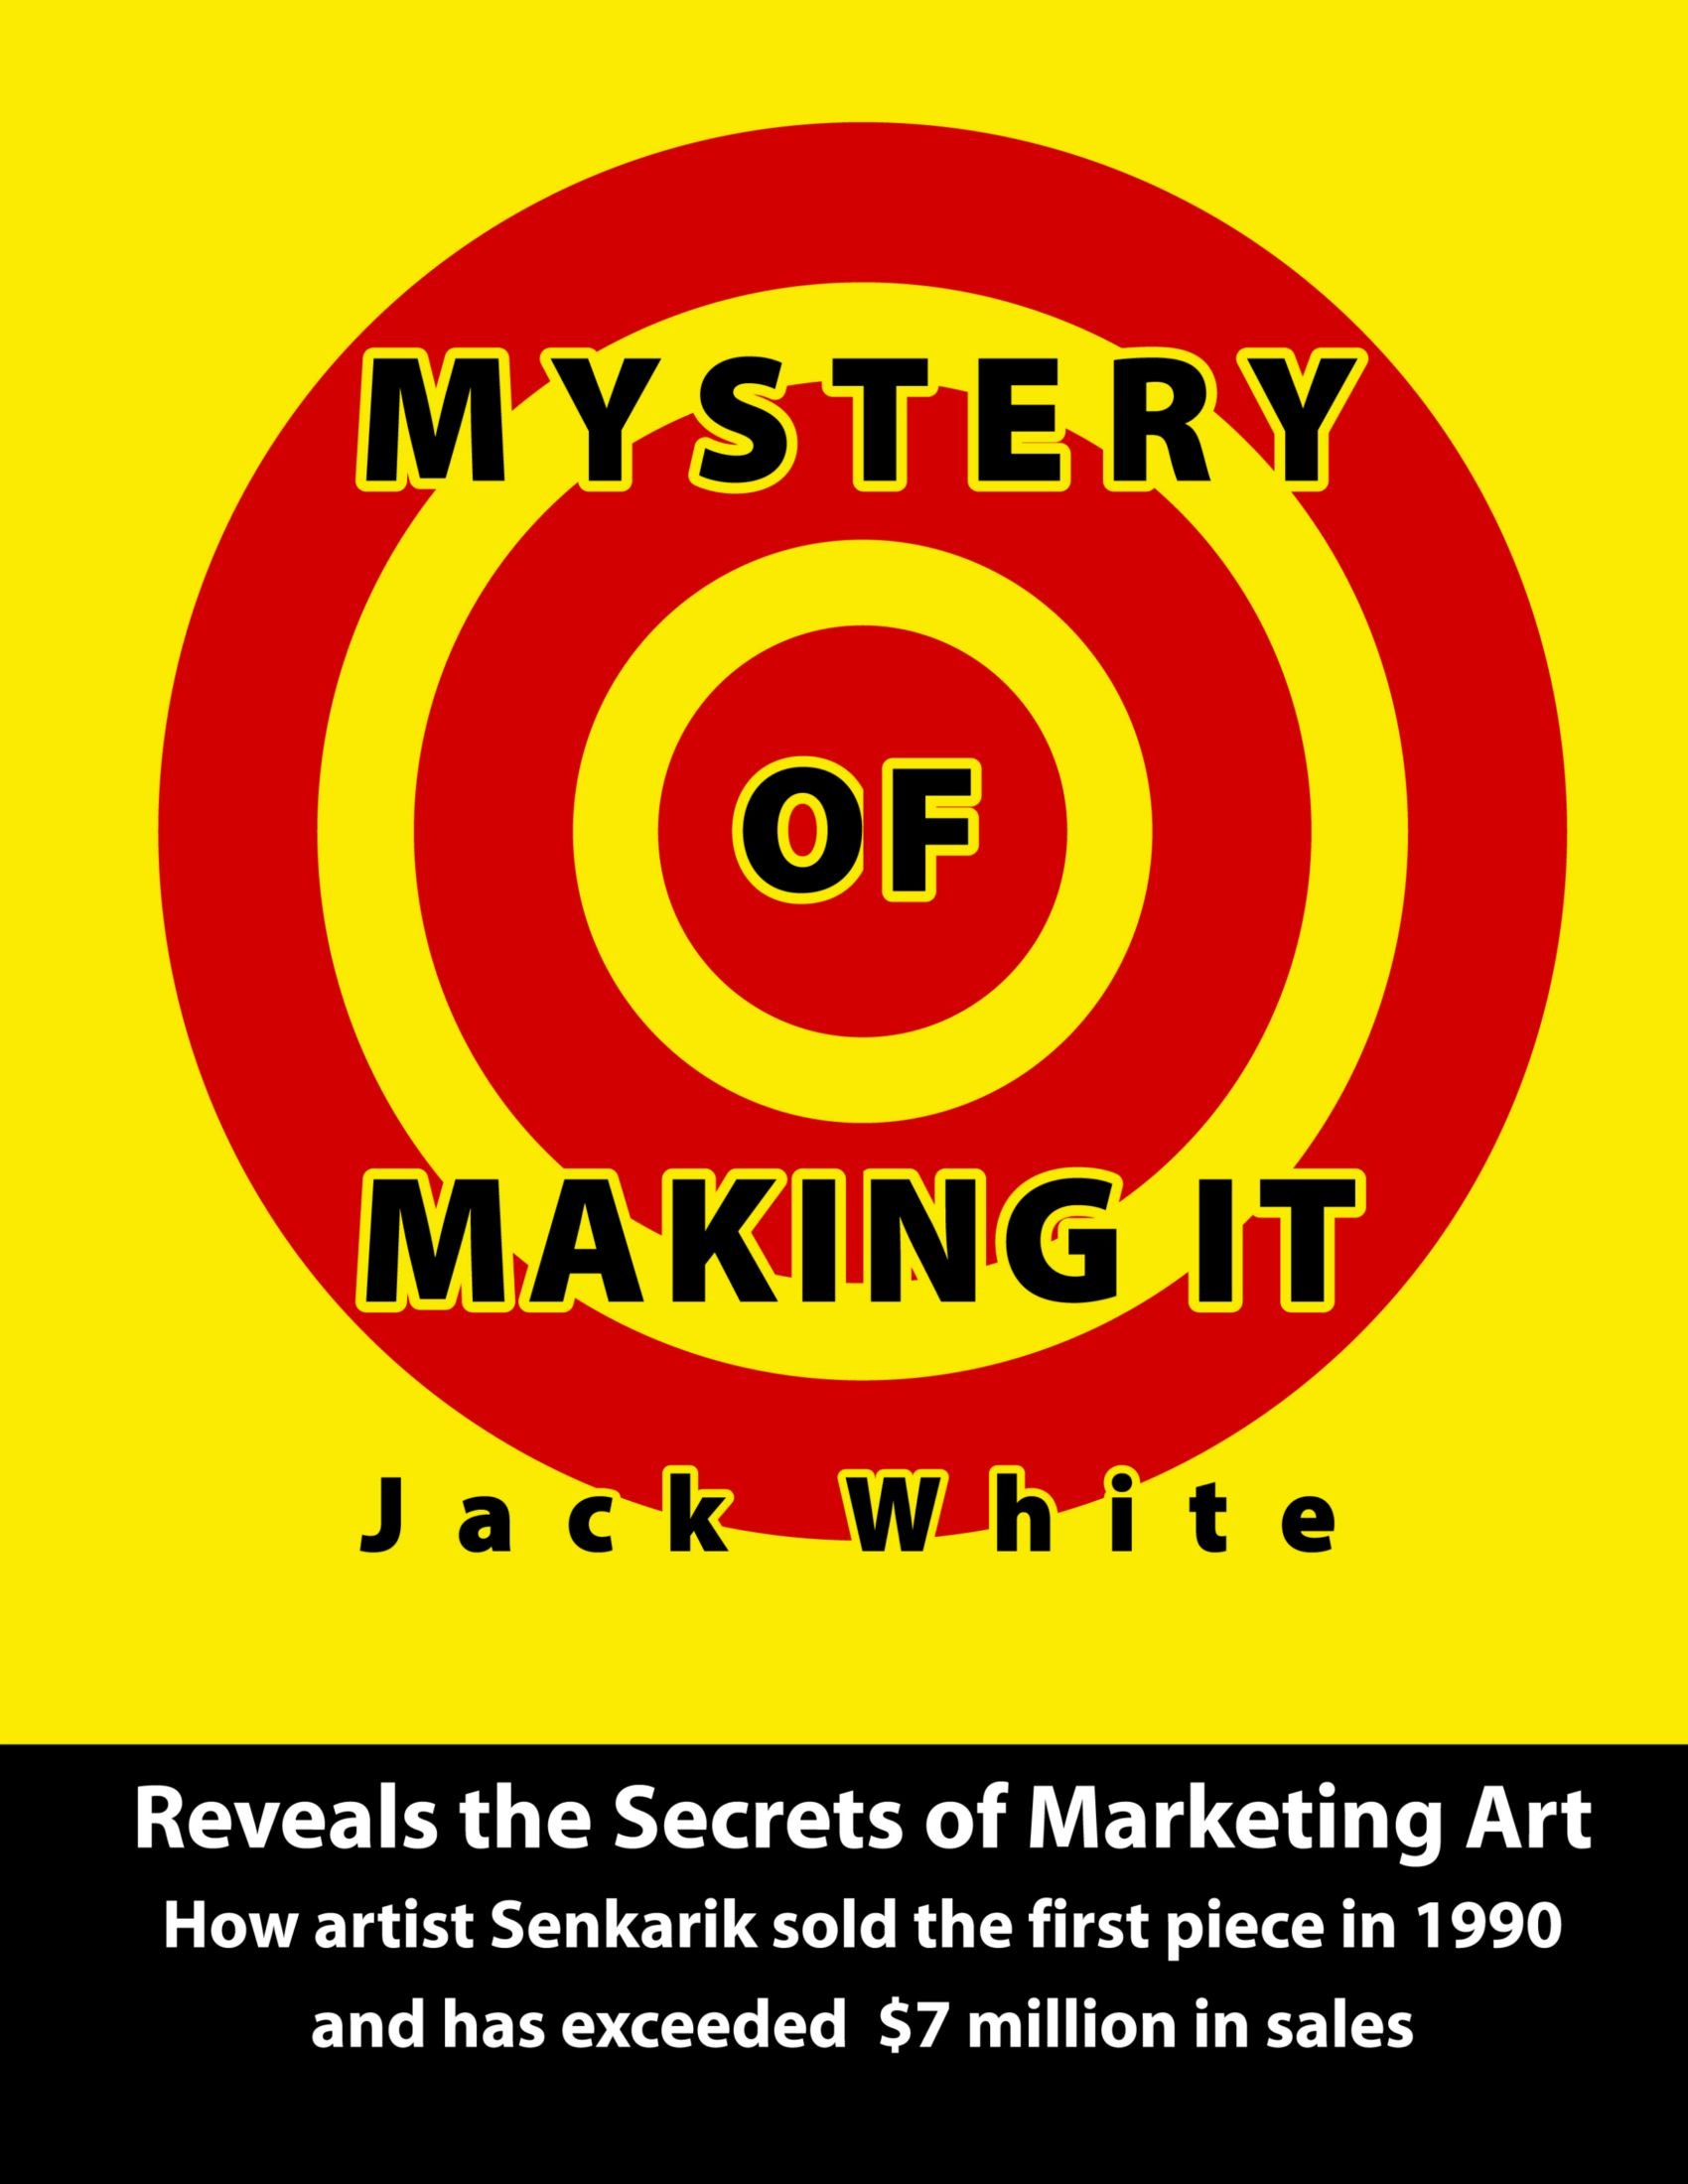 Mystery of Making It ebook